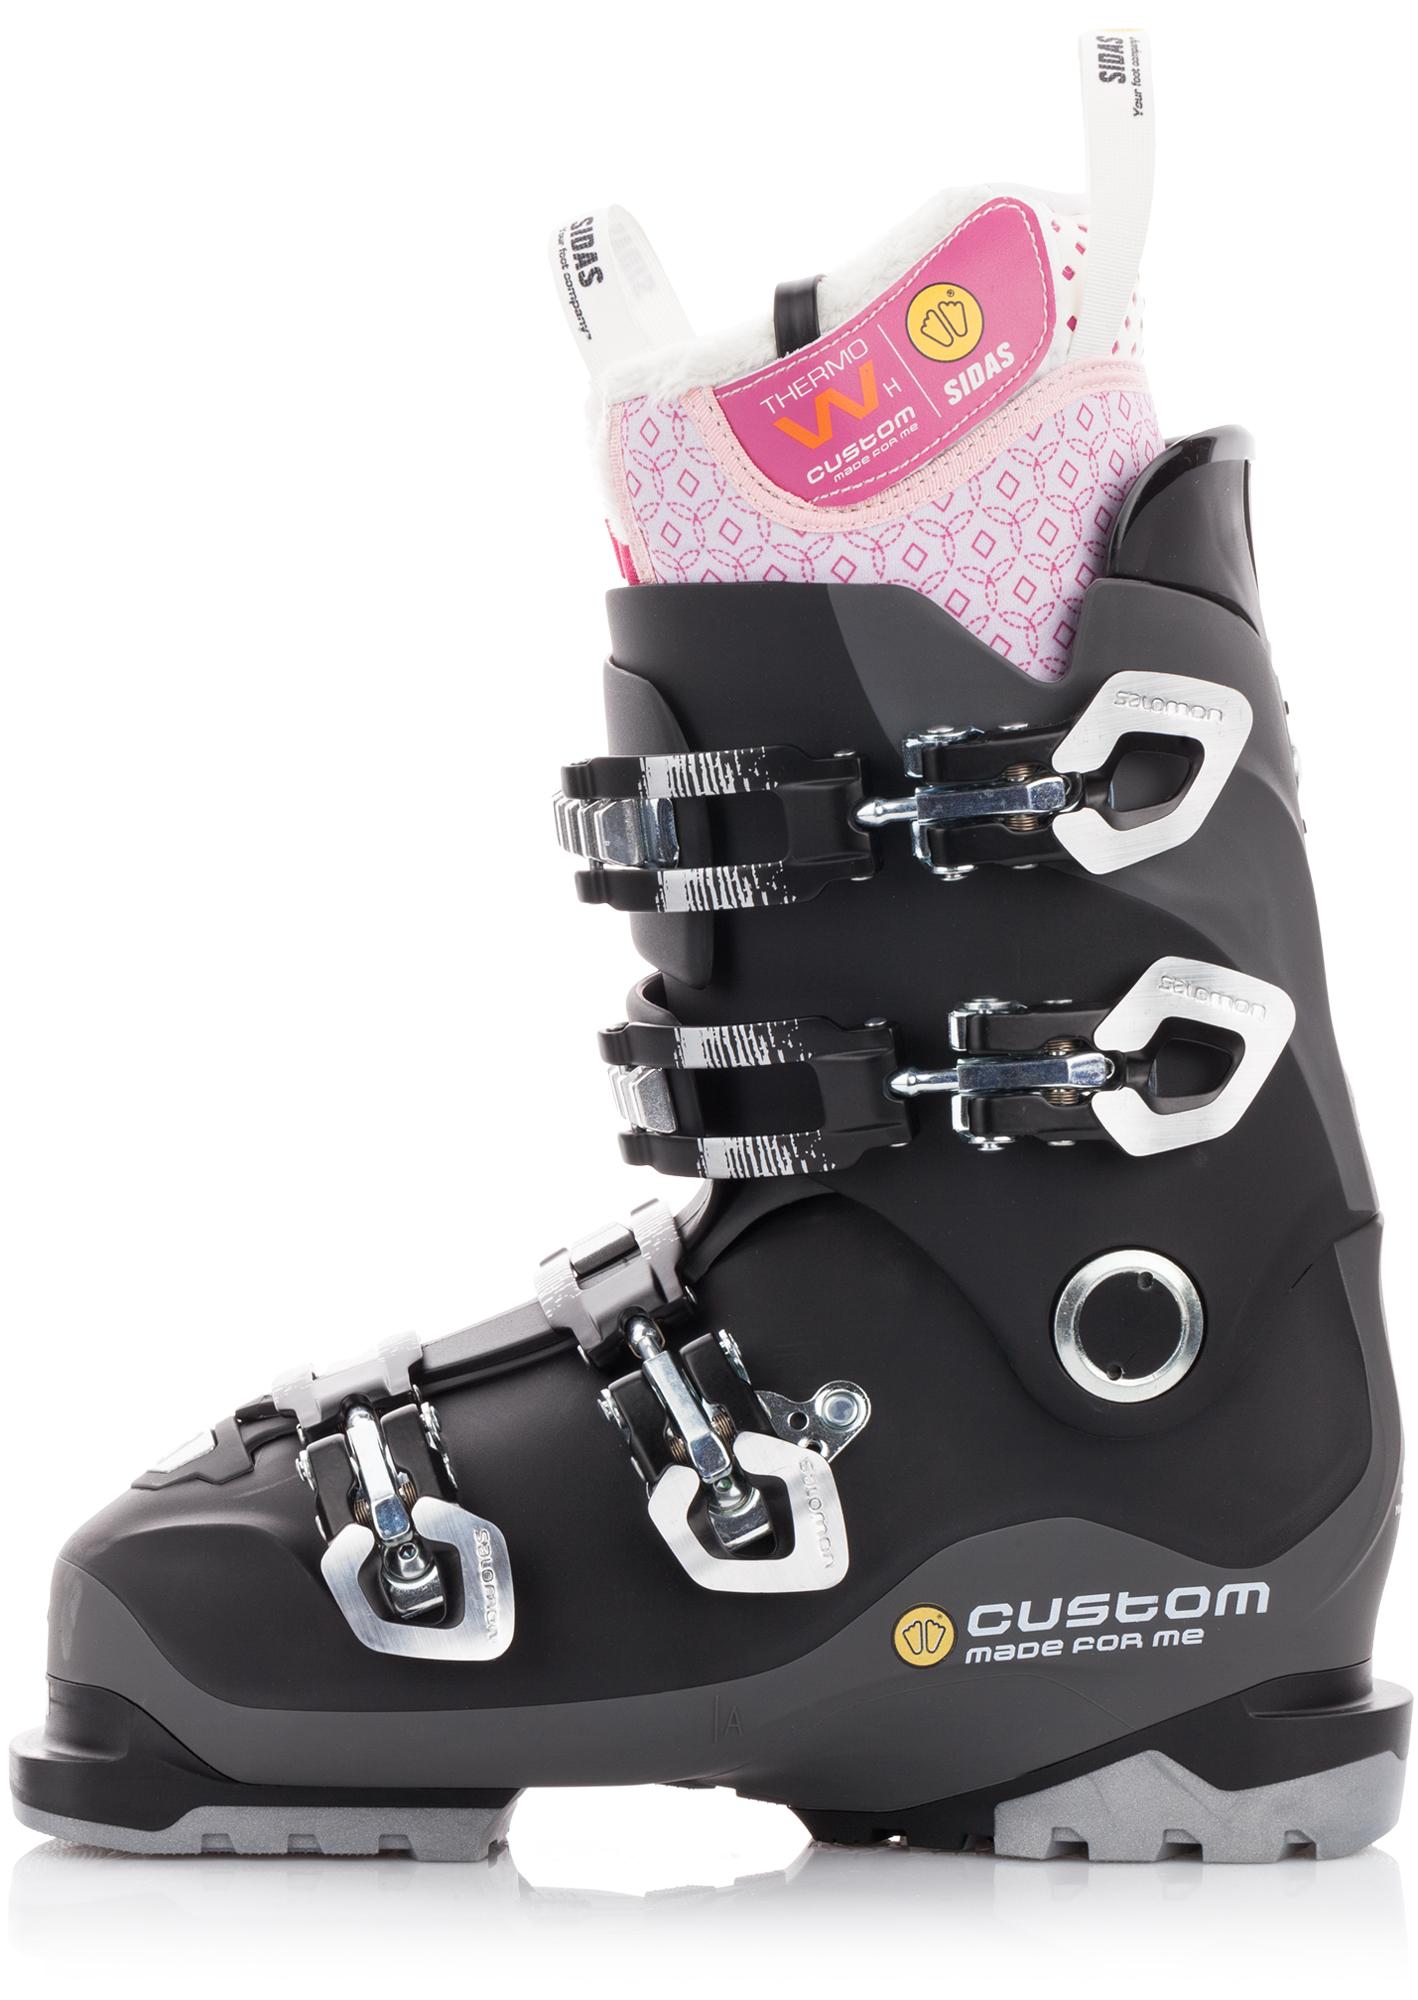 Sidas Ботинки горнолыжные Sidas CX-Pro + Woman H, размер 36 ботинки женские daze цвет темно серый 16507z 3 2l размер 36